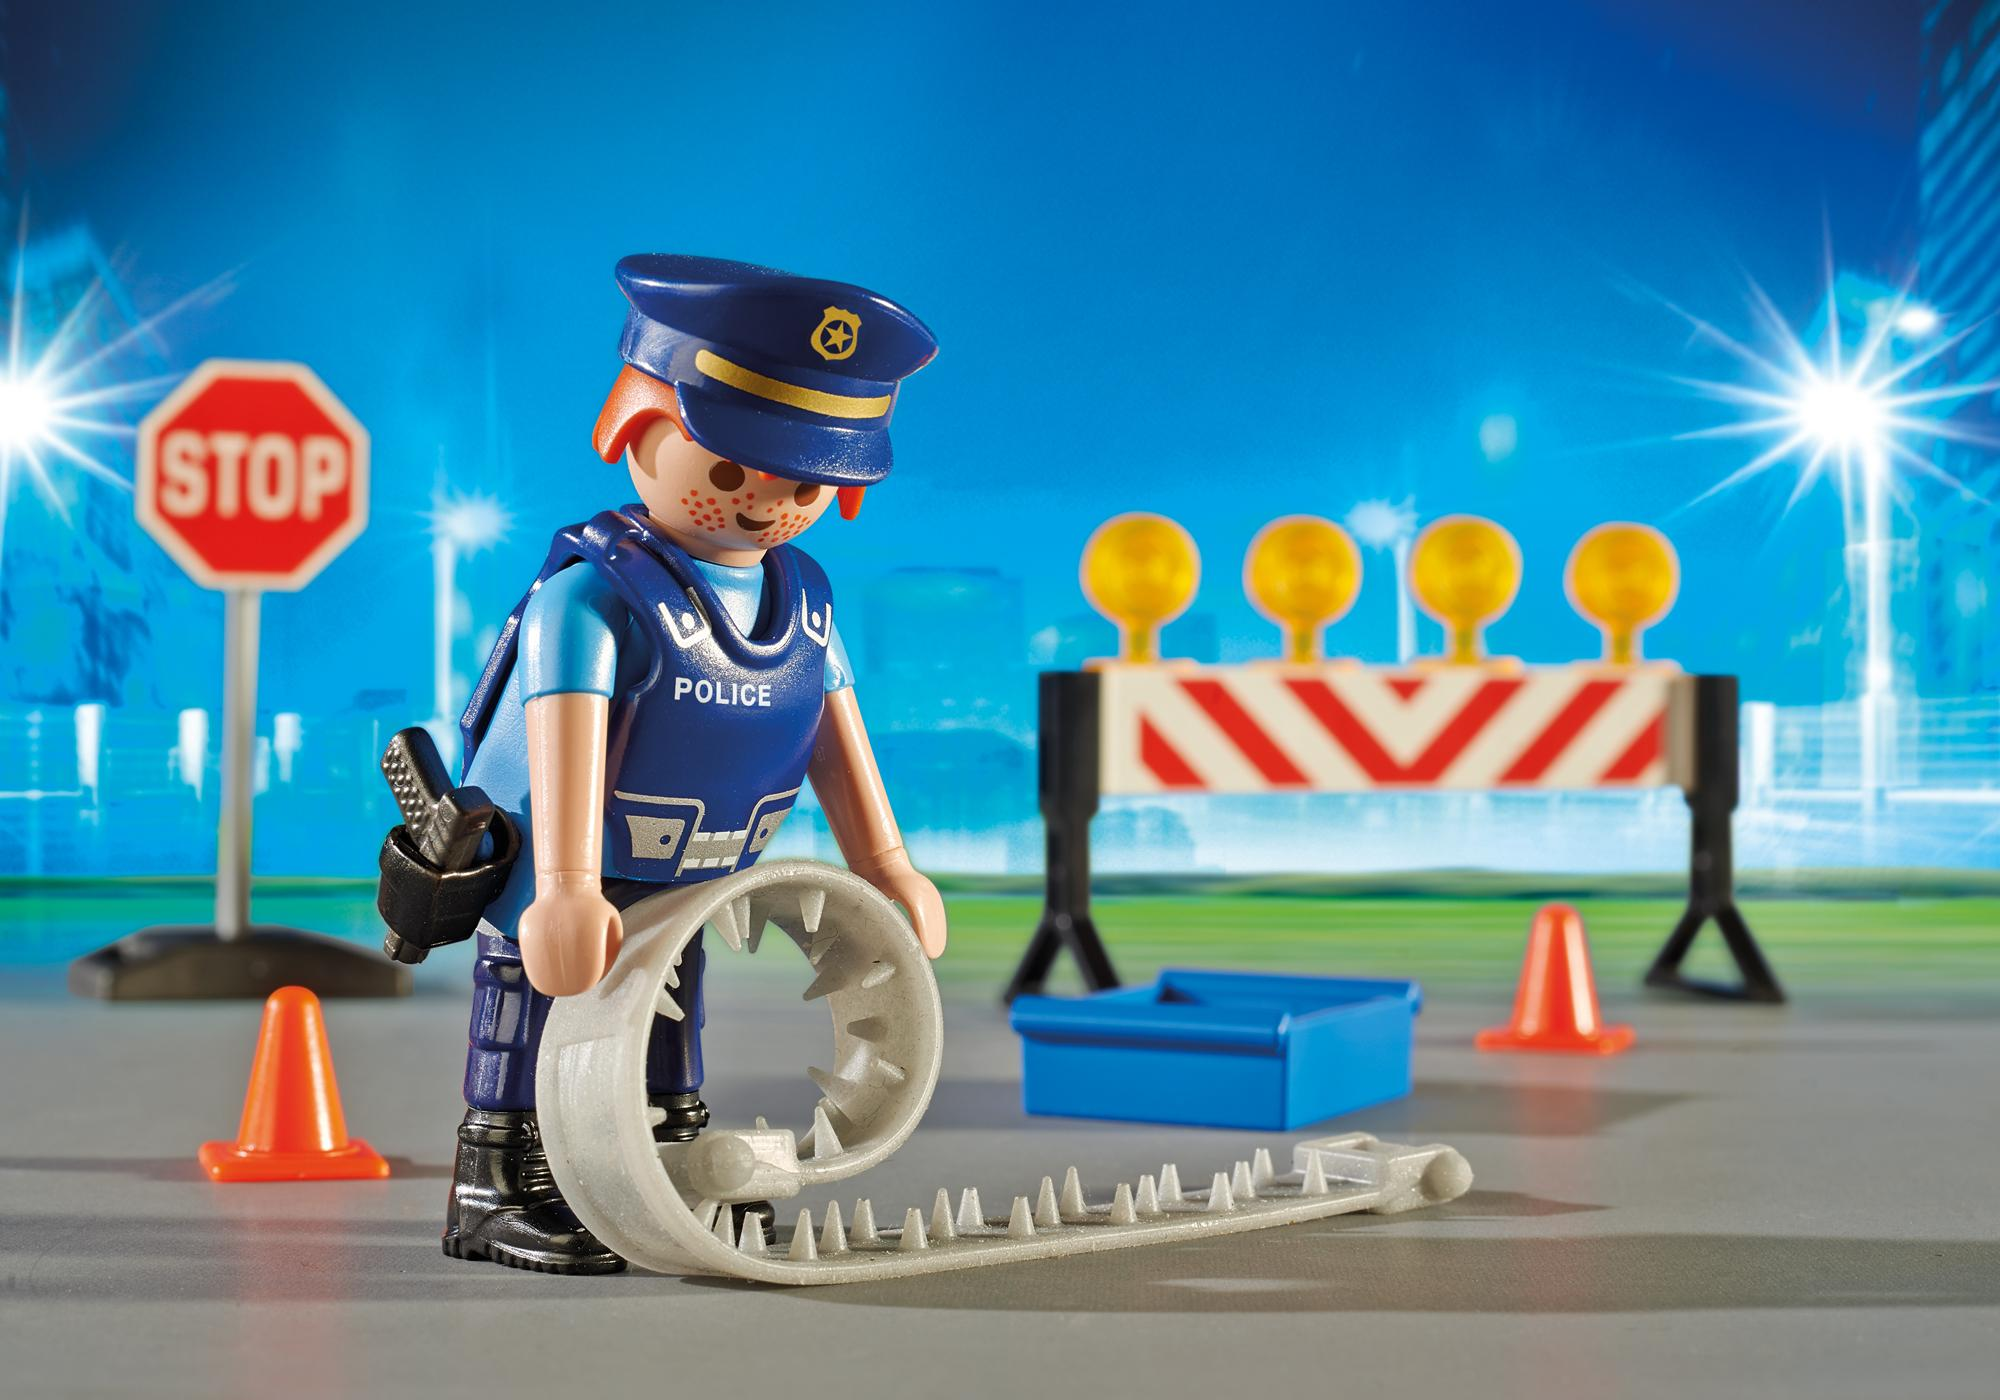 http://media.playmobil.com/i/playmobil/6924_product_extra1/Police Roadblock